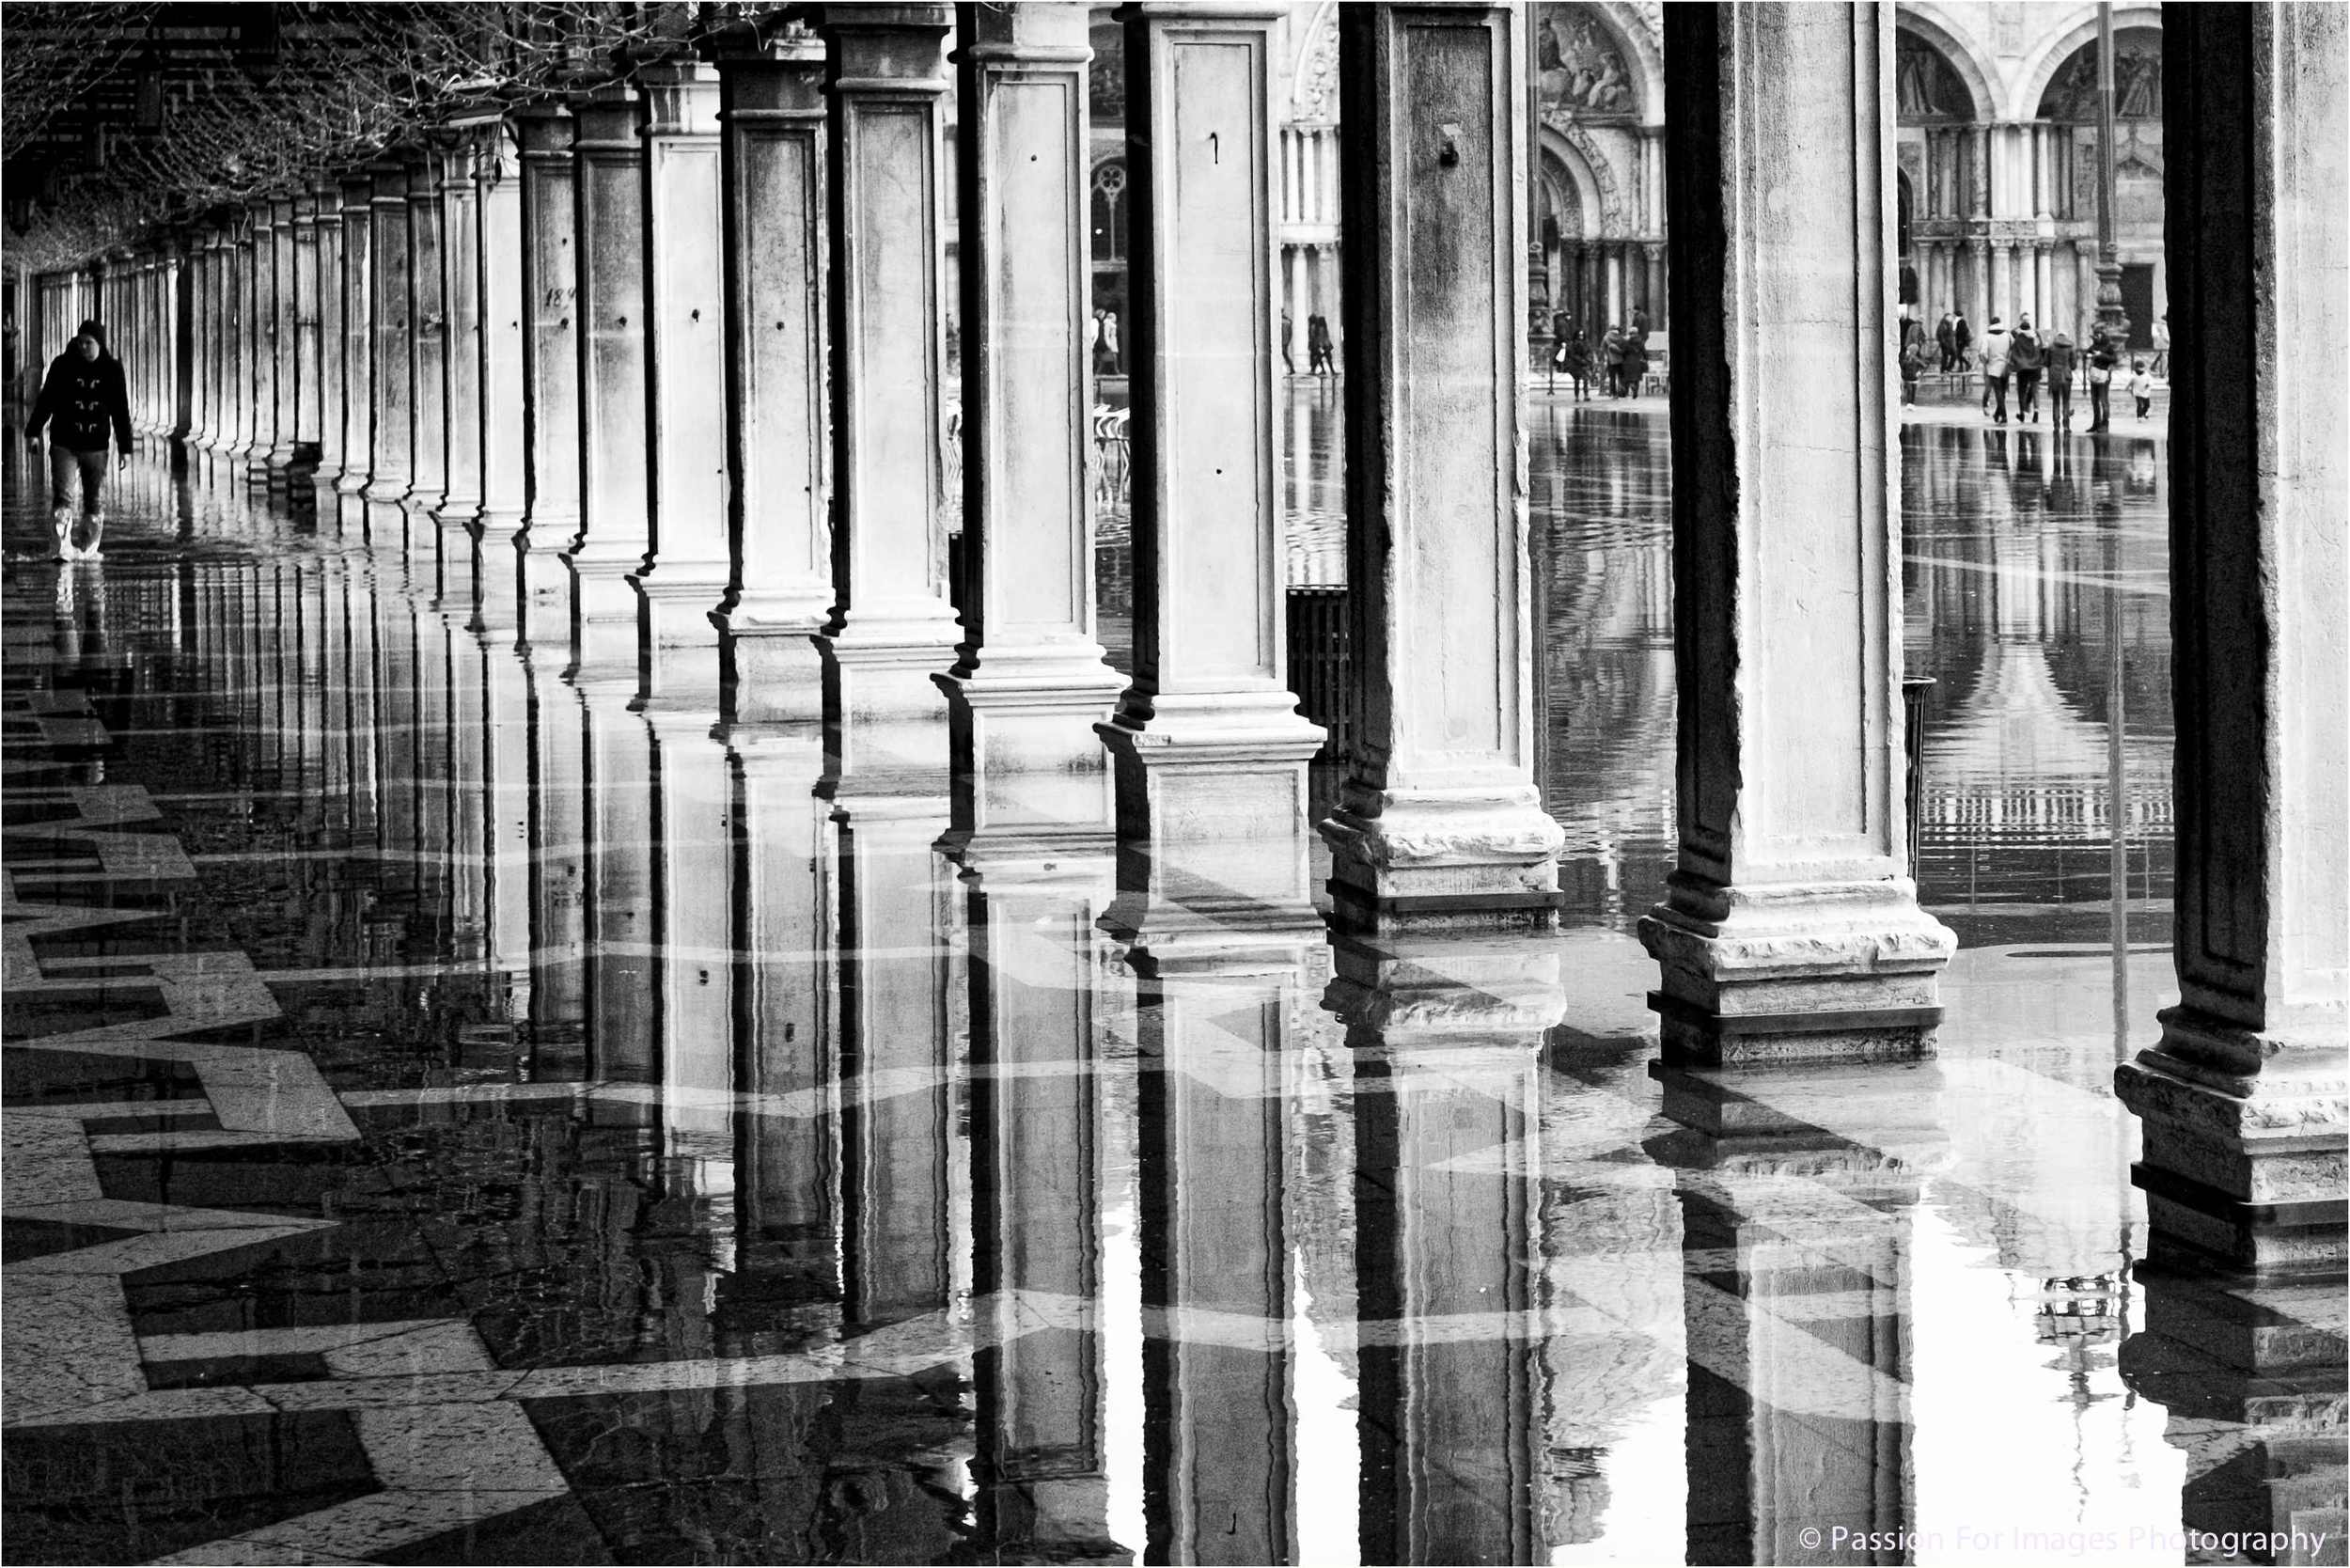 DSCF1673_2016_01_Venice-Edit-Edit.jpg